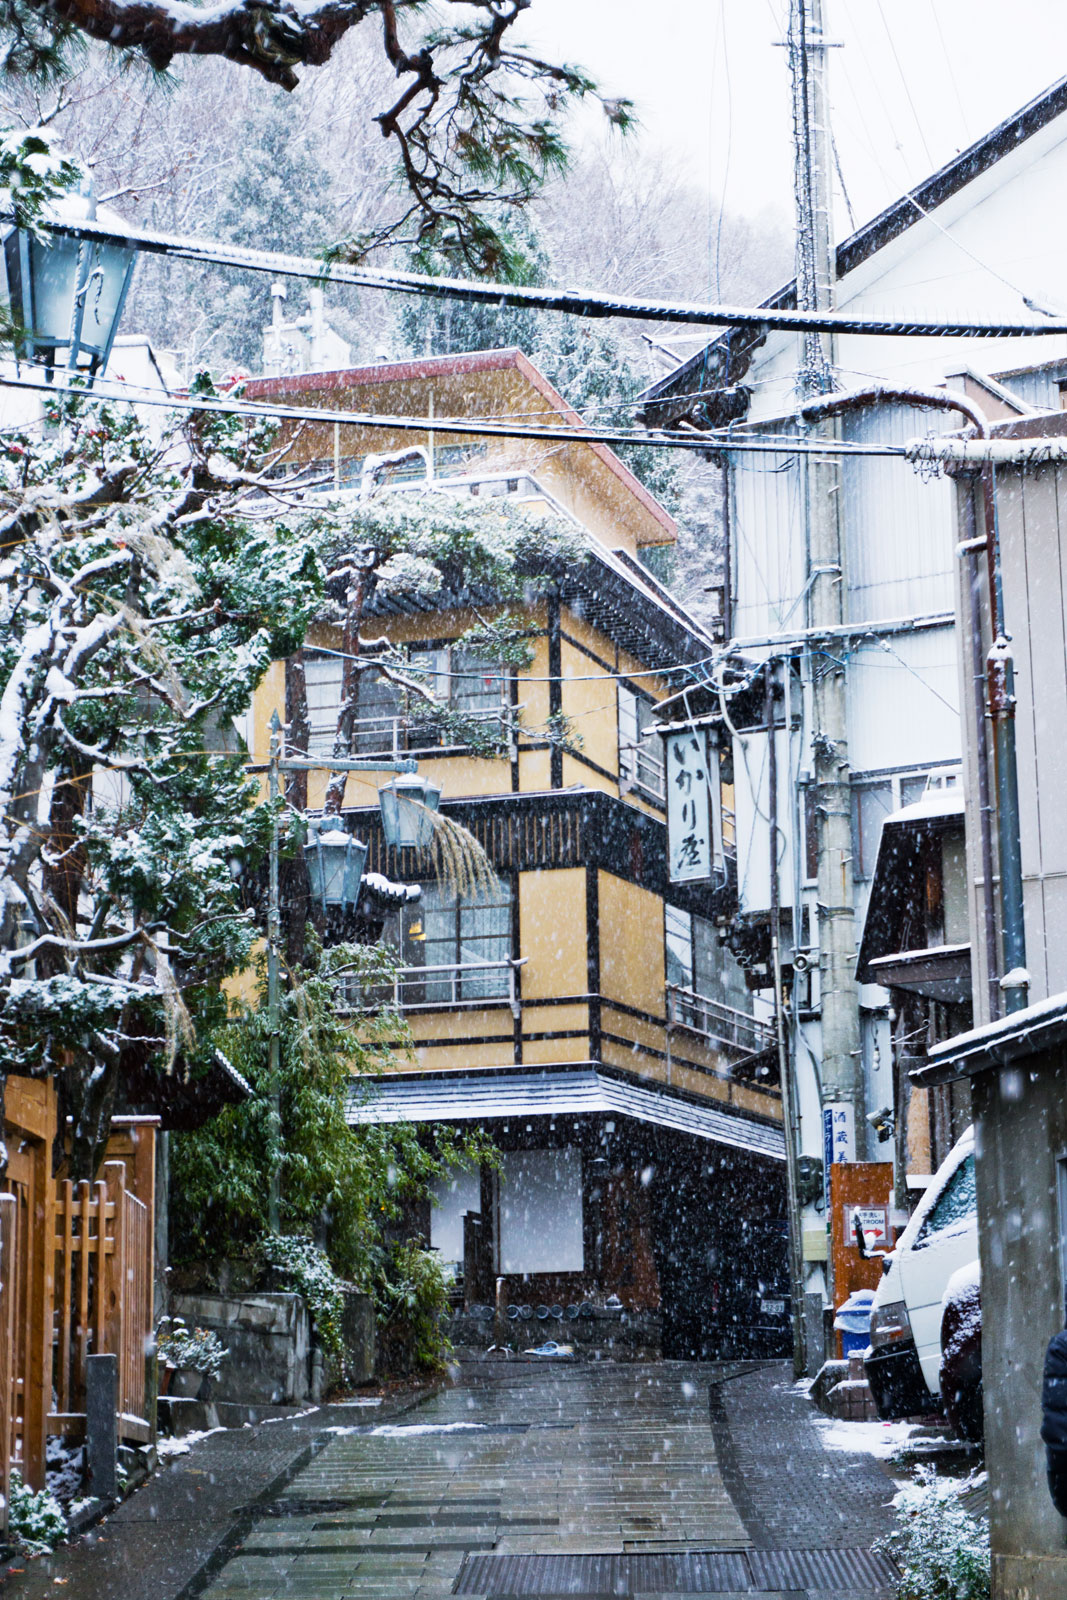 Shibu Onsen Nagano Japan snow